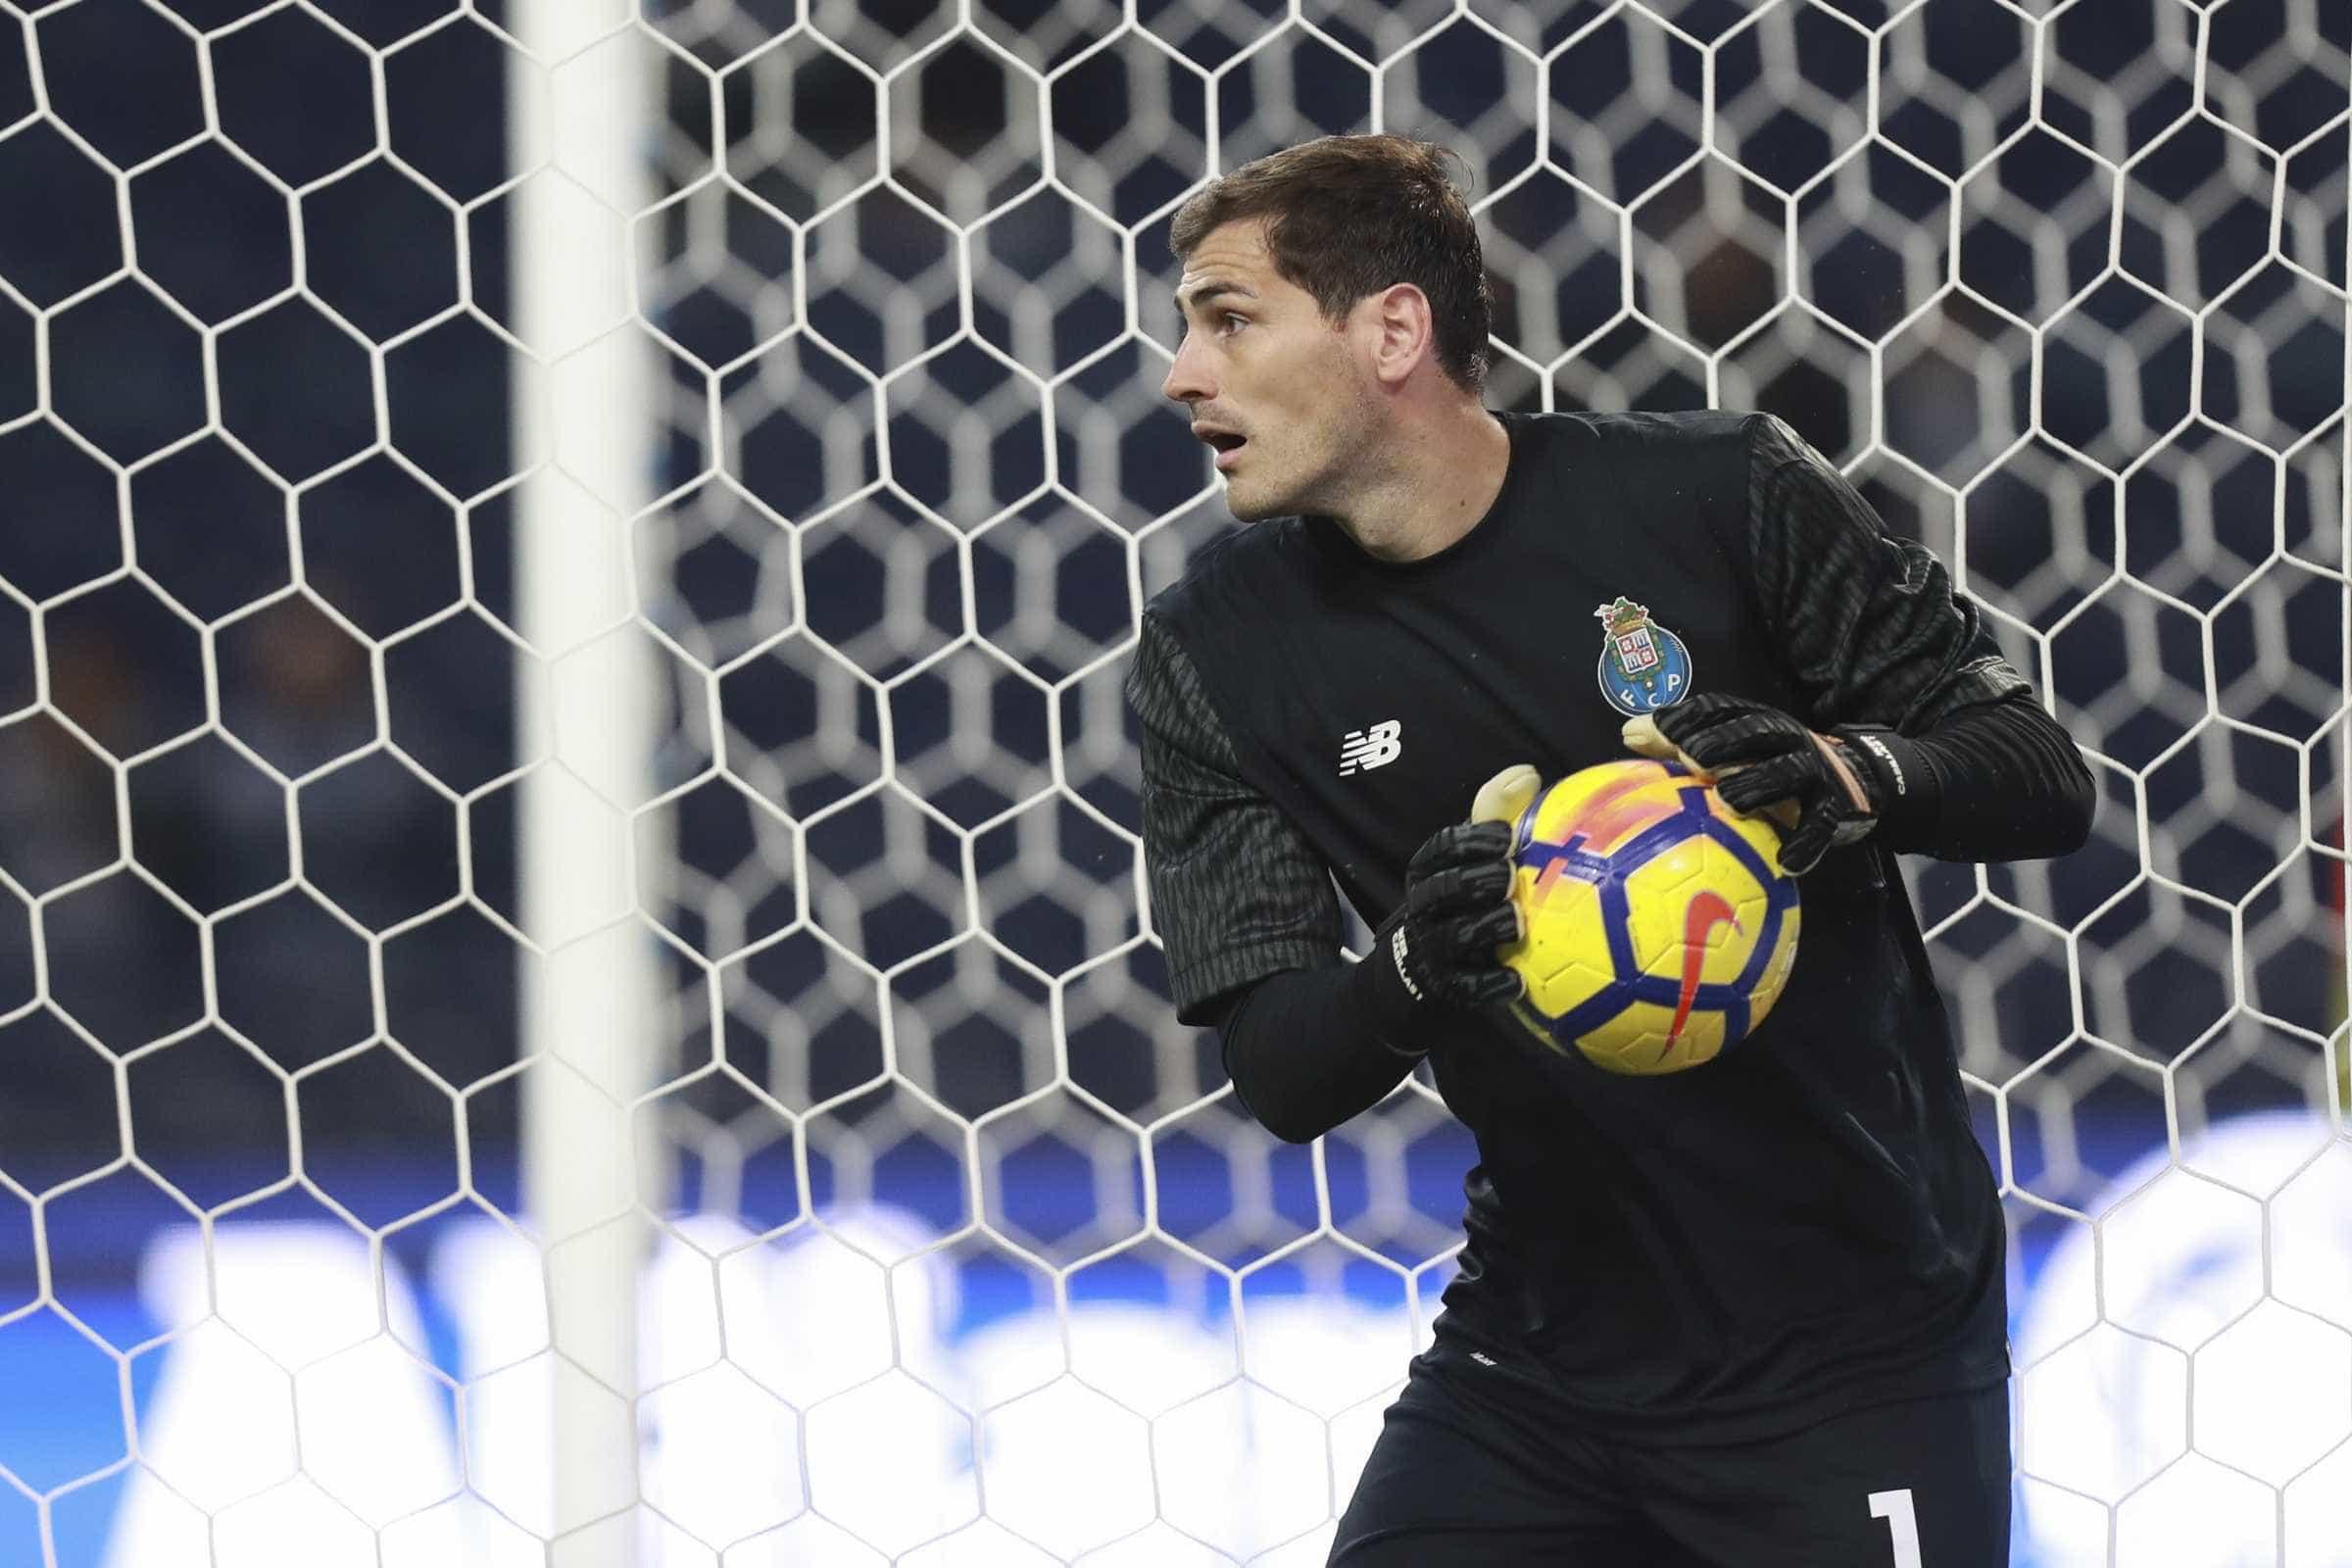 Casillas: As 'pisadas' de Buffon, o Liverpool e o jogo saboroso... na Luz